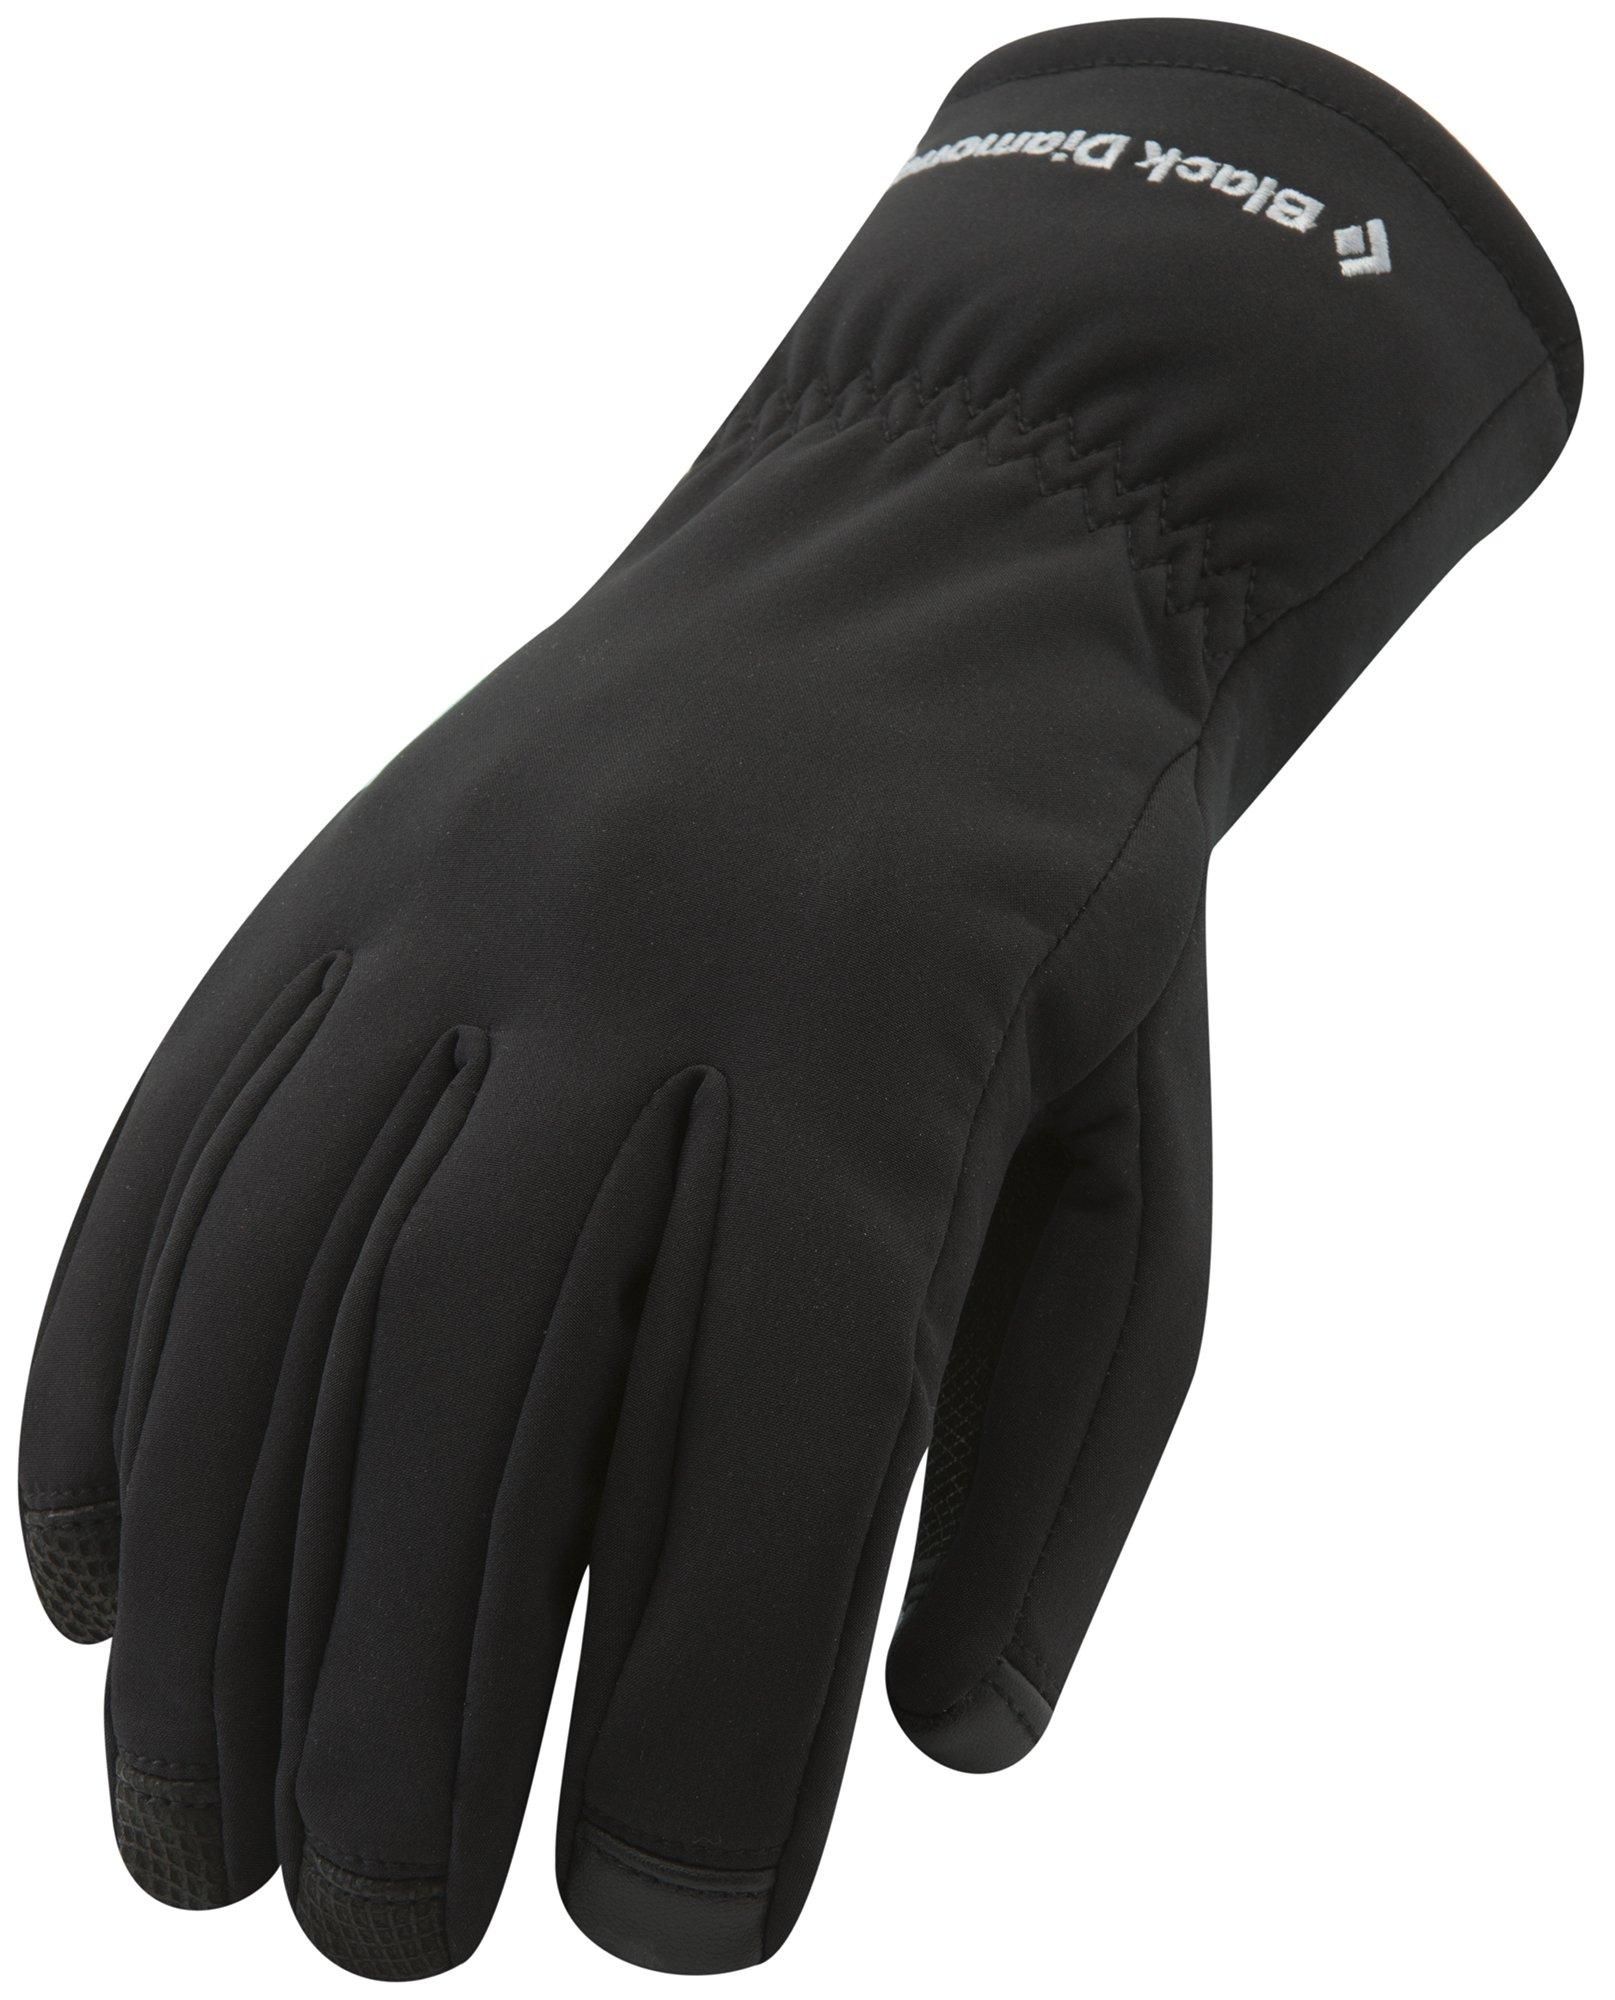 Black Diamond Soft Shell Skiing Gloves, Black, Large